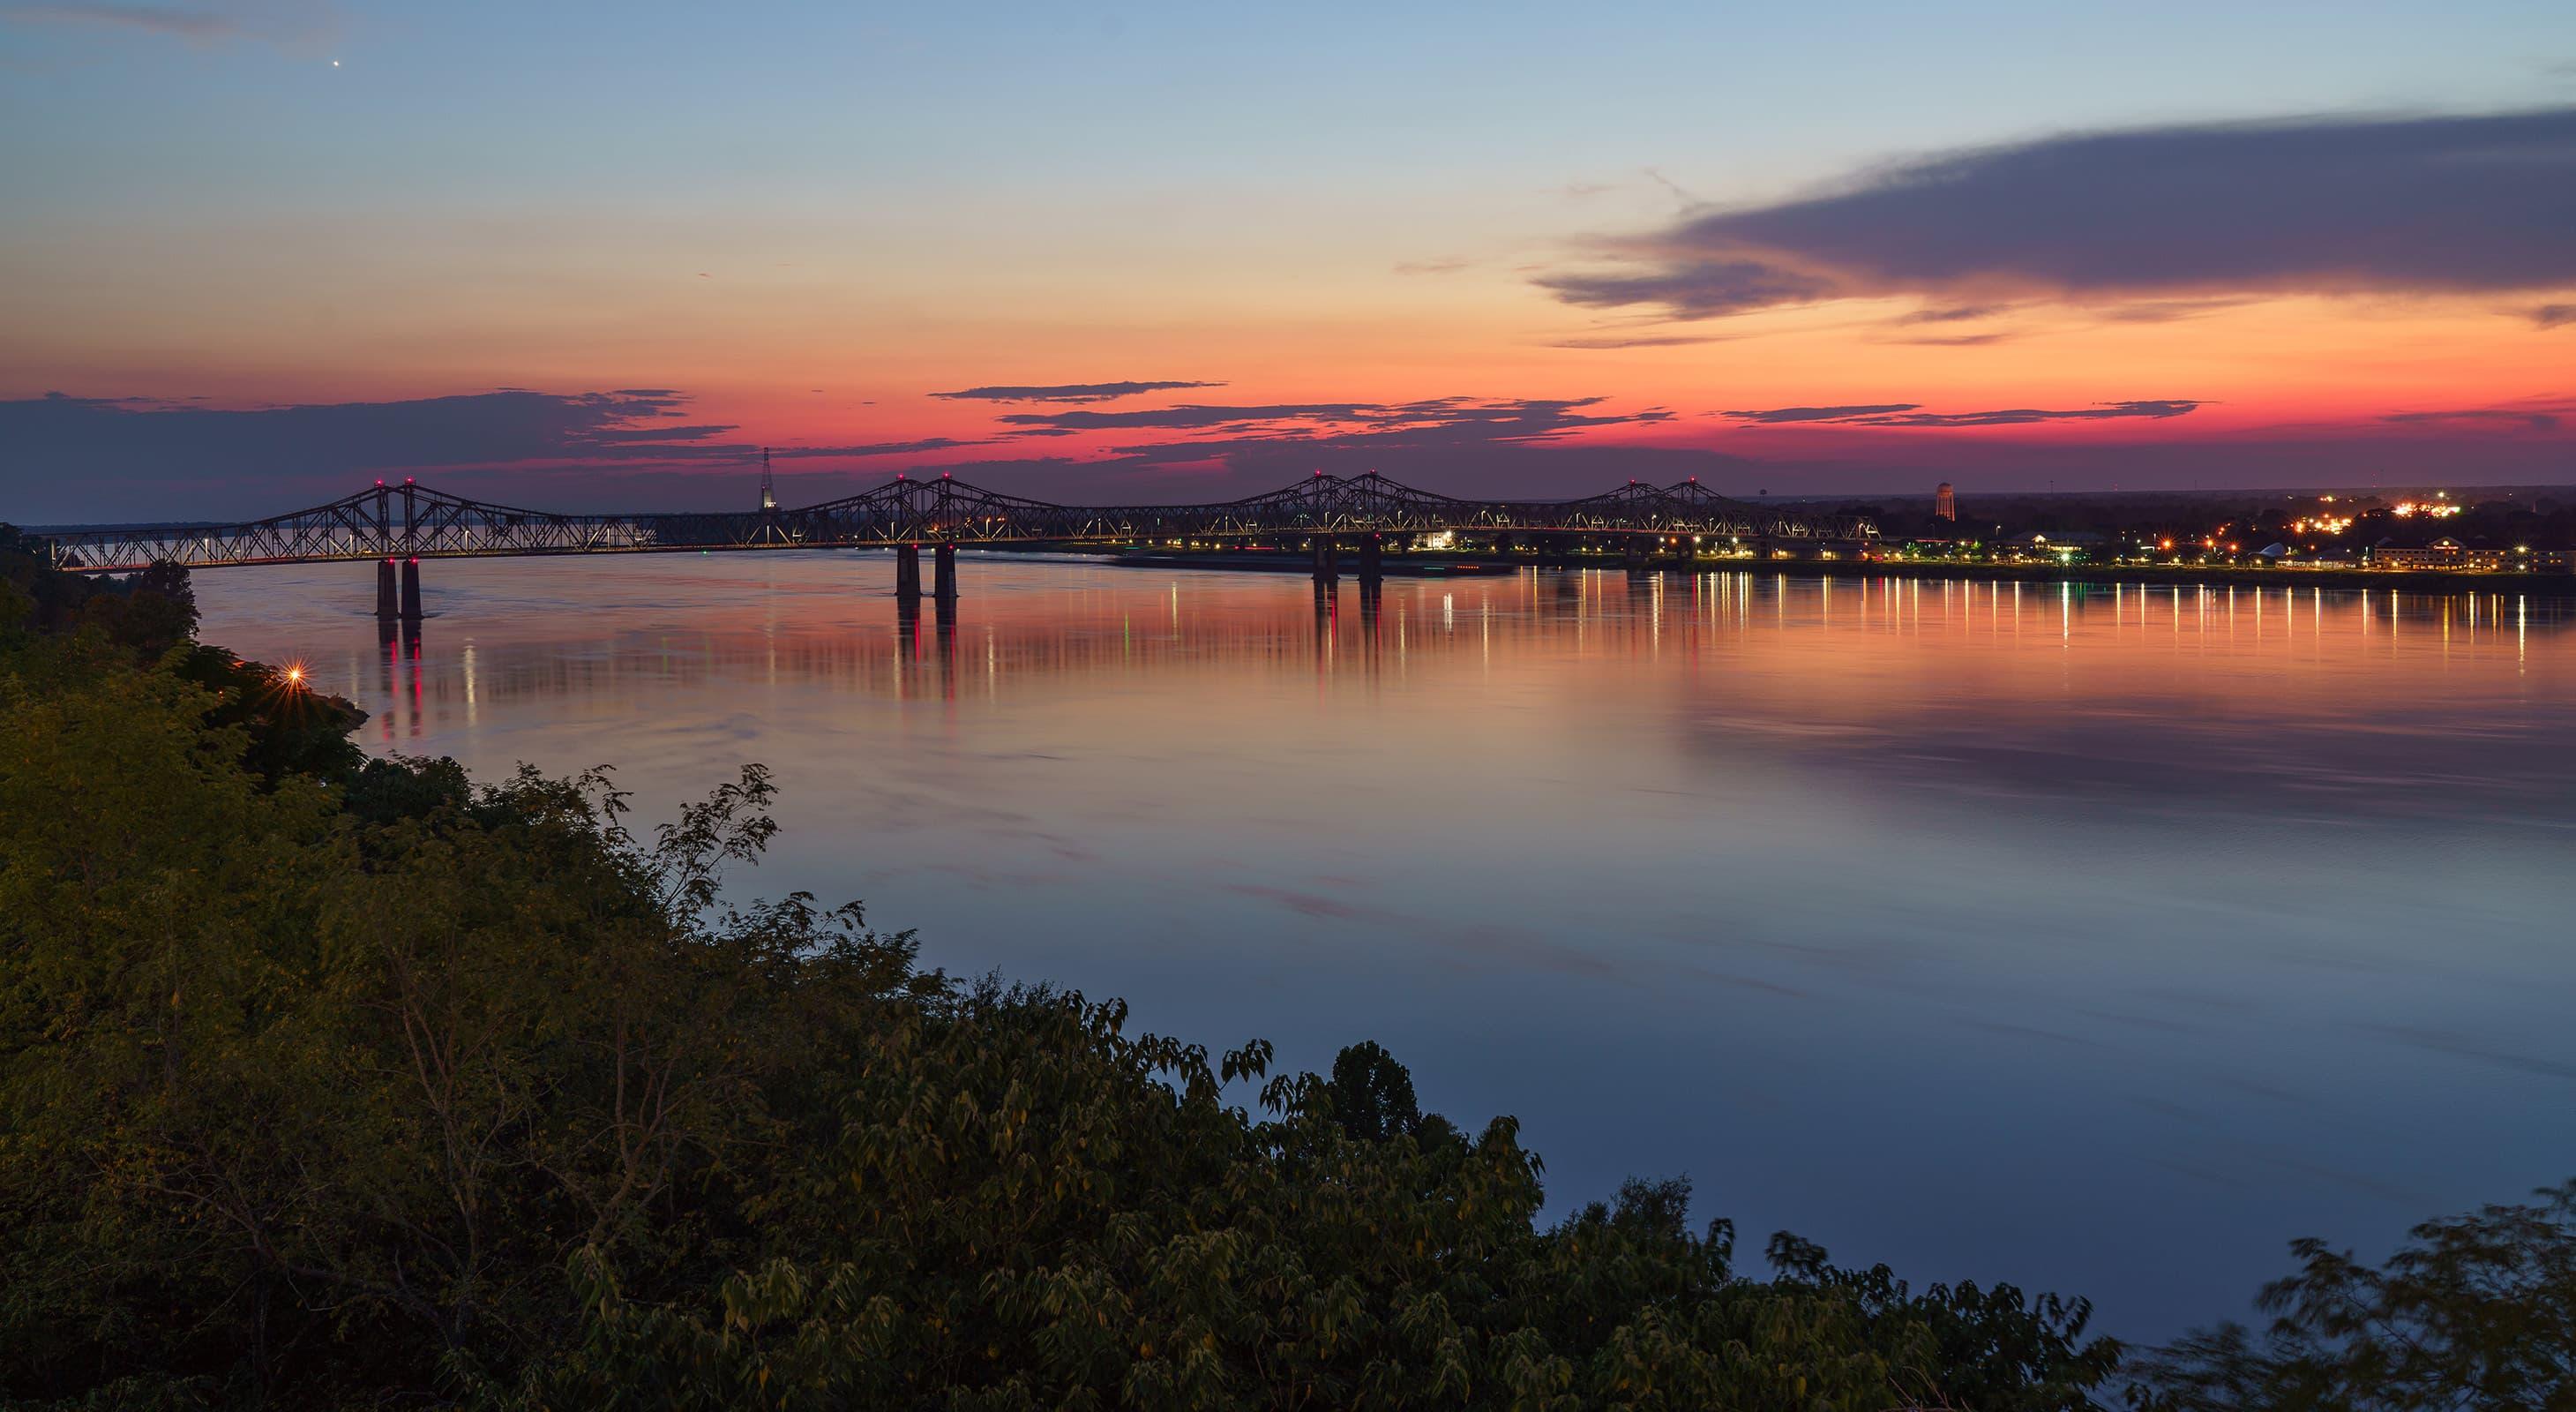 bridge over river at sunset